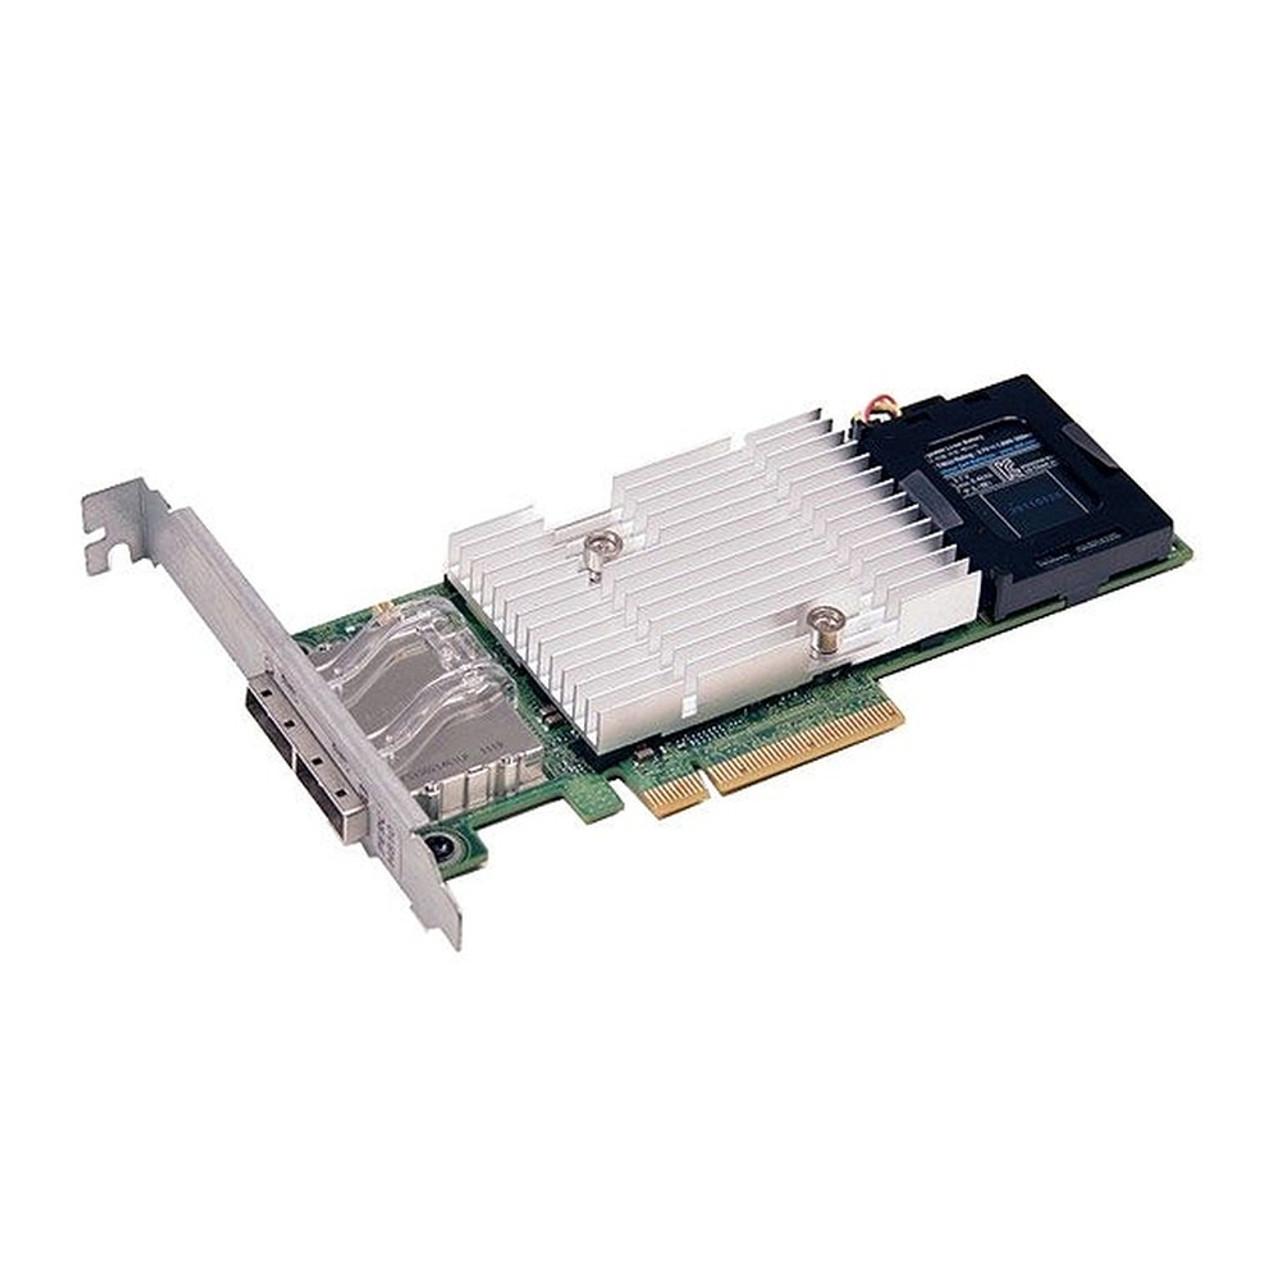 Dell KKFKC PowerEdge PERC H810 1GB NV Internal/External RAID Controller  6Gb/s